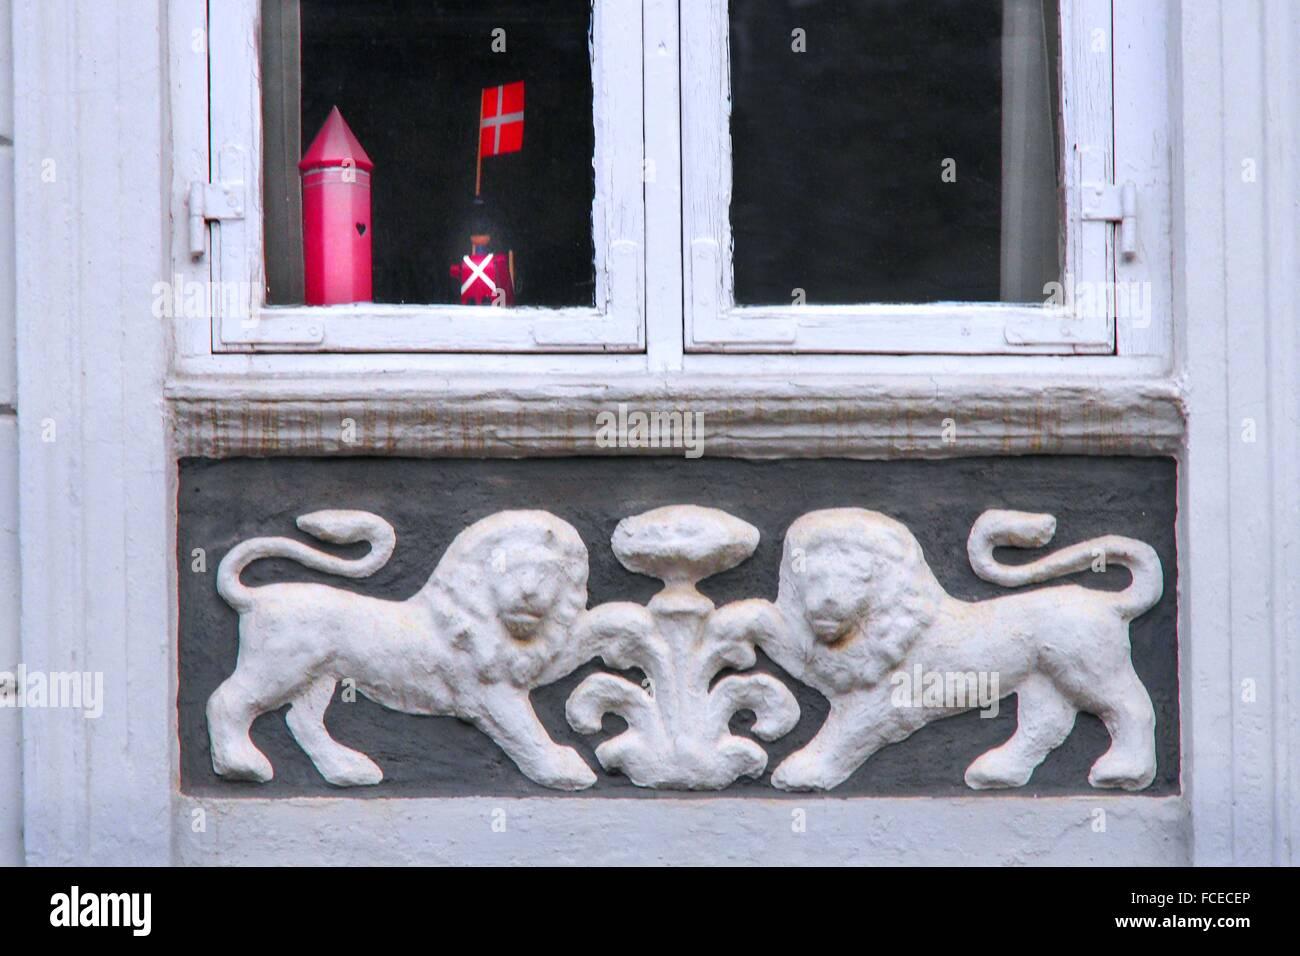 Danish private home window, Koge, Sjælland, Denmark - Stock Image